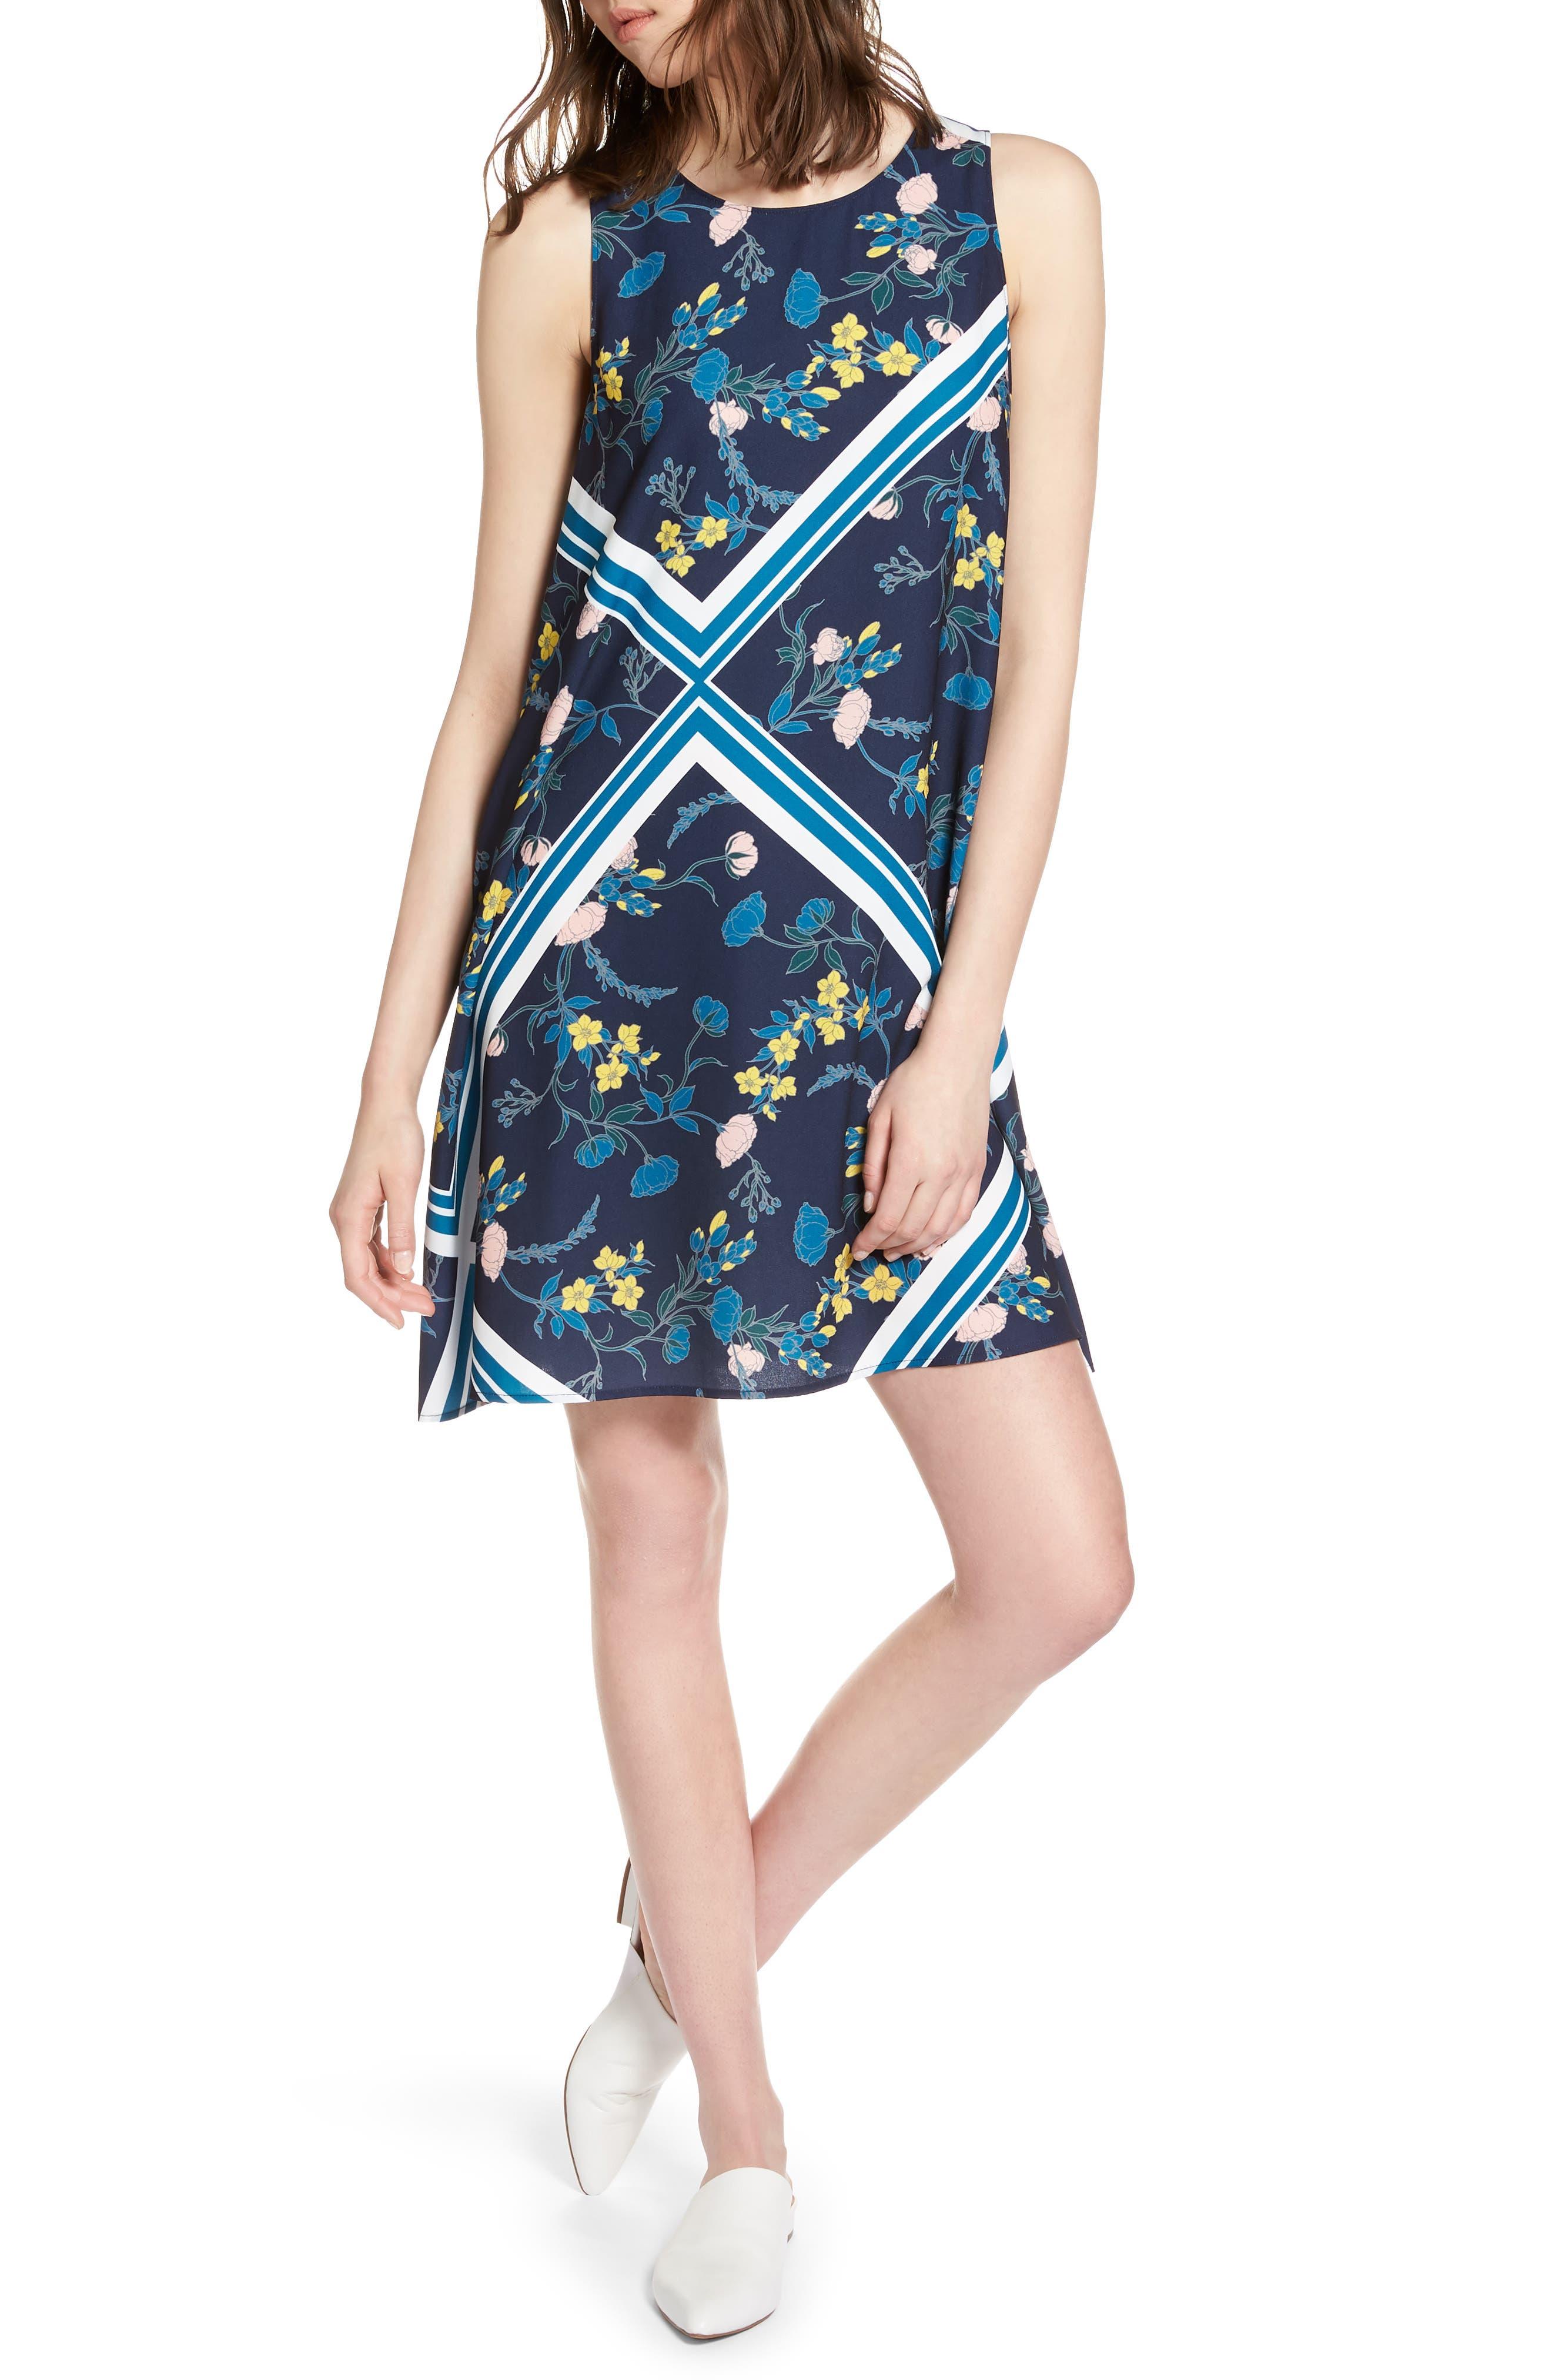 Alternate Image 1 Selected - Halogen® A-Line Dress (Regular & Petite)